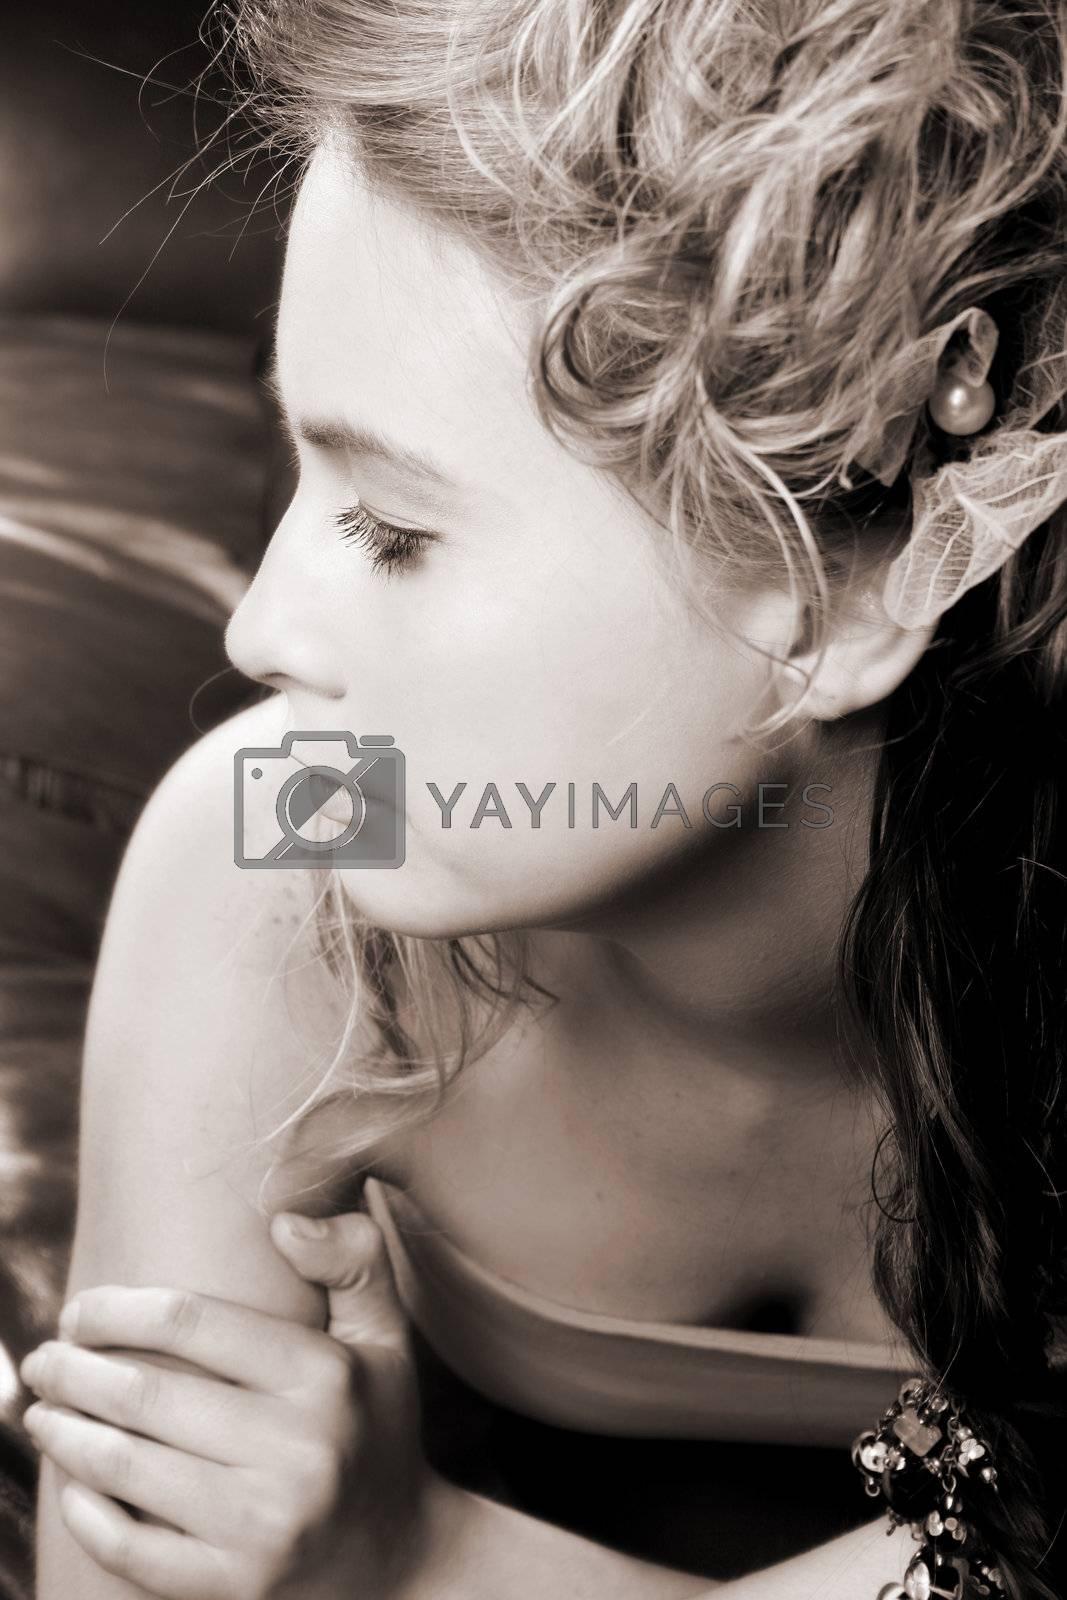 Beautiful female model jewelery and hair styled